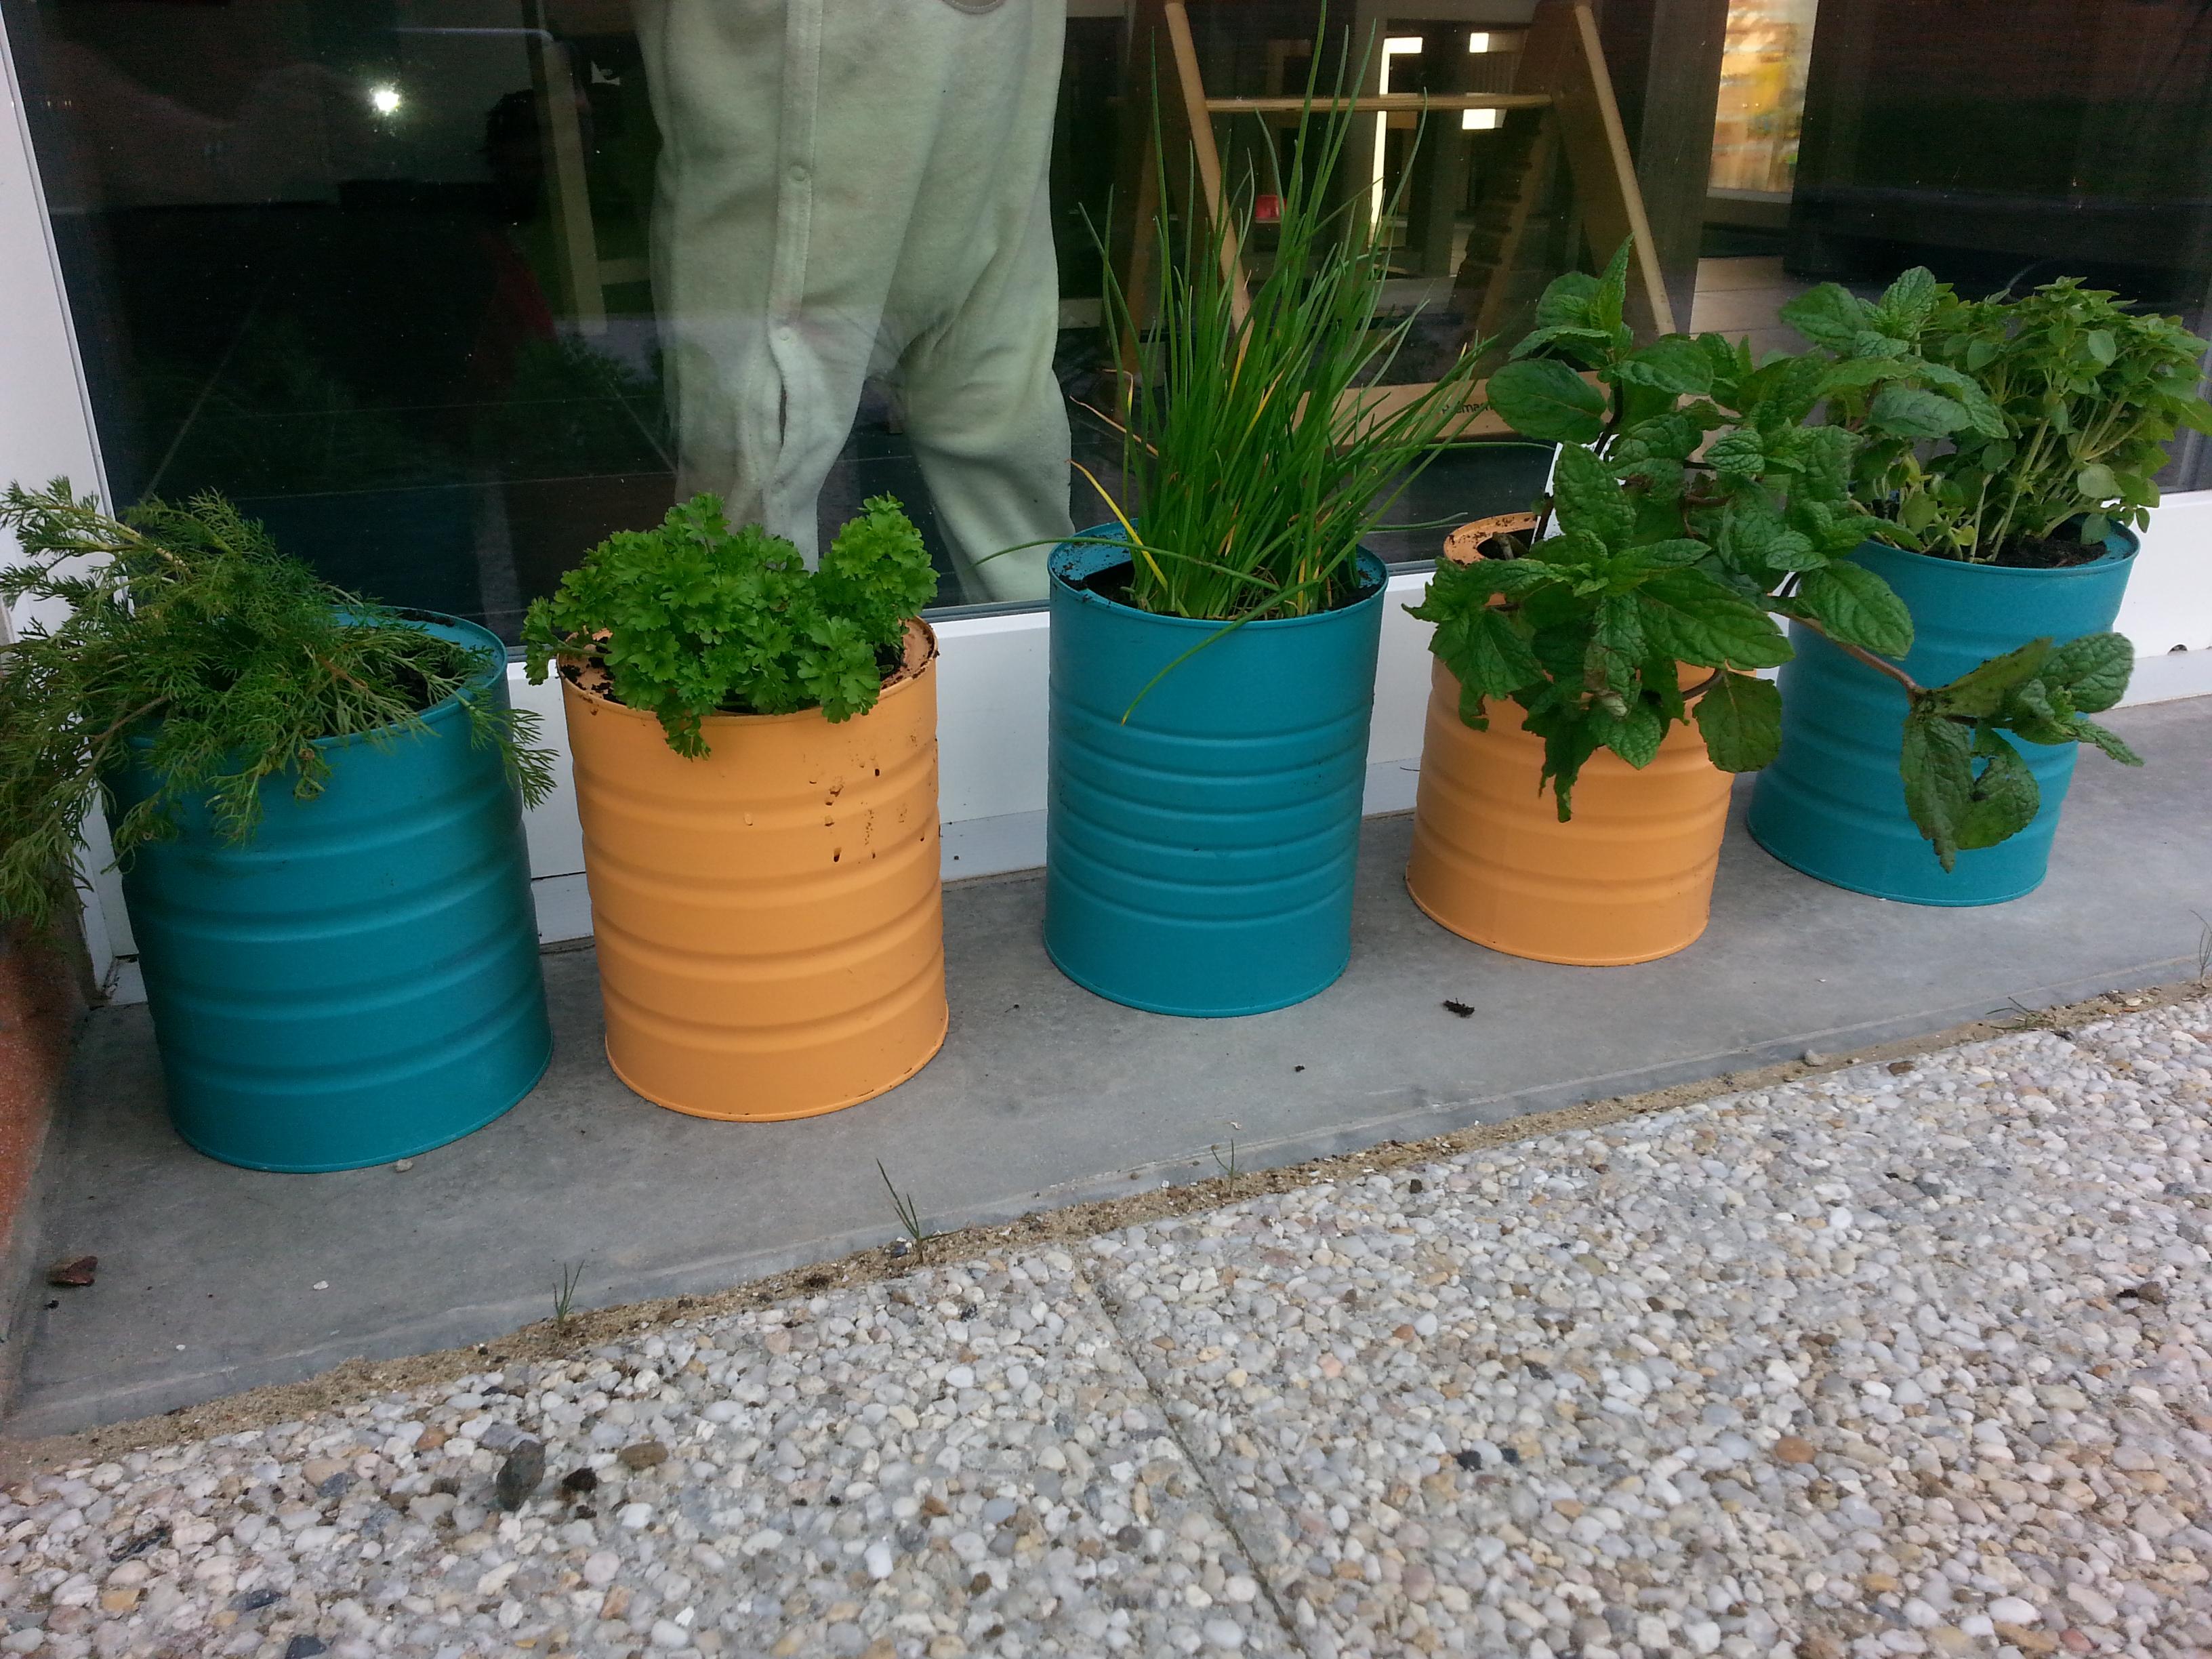 boite-lait-aromate-plante